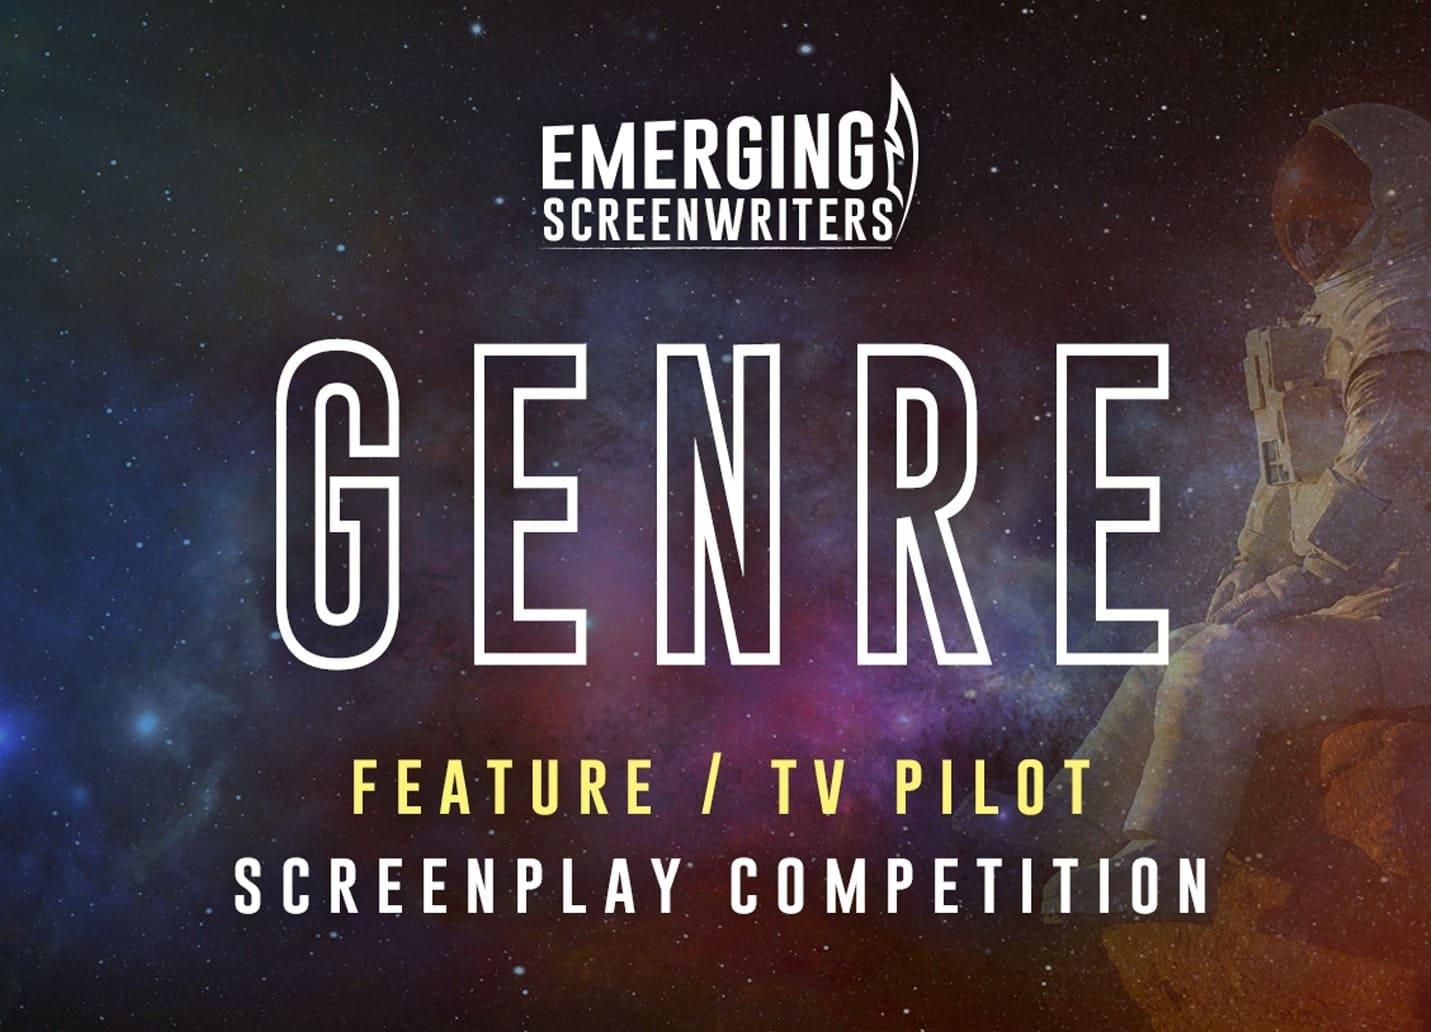 Emerging Screenwriters Screenplay Competition